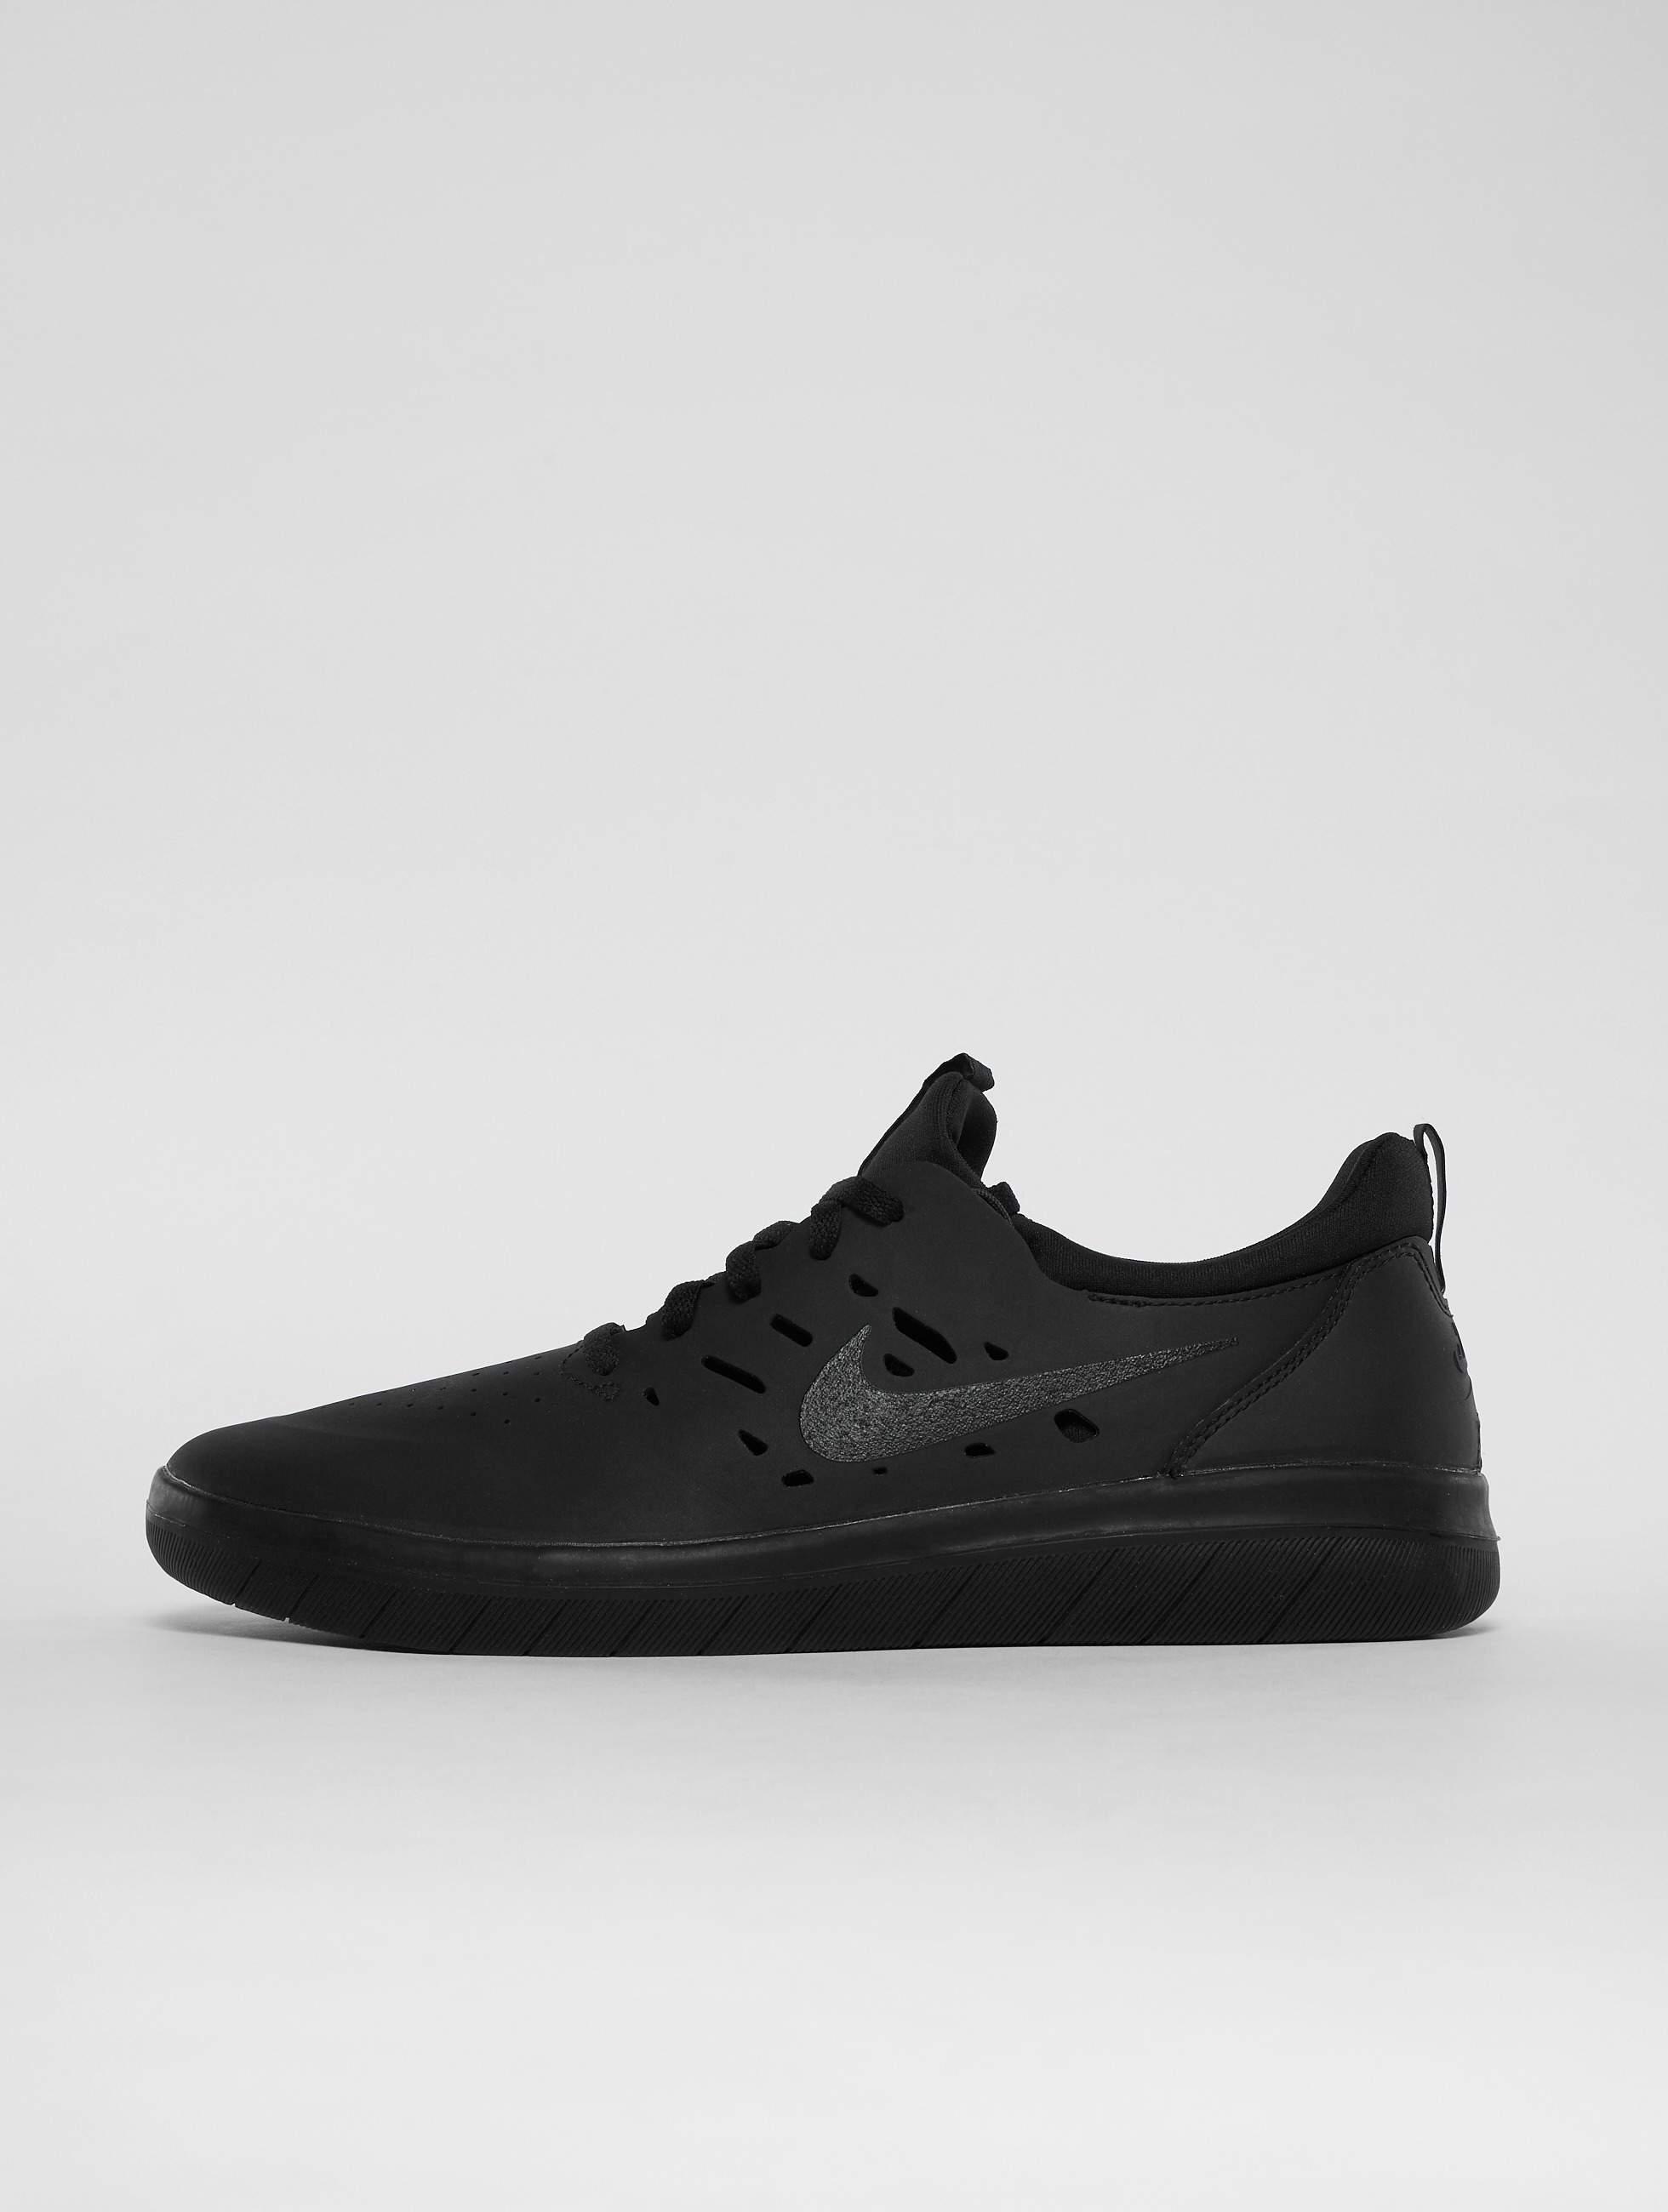 90b7c08e52b Nike SB schoen / sneaker Sb Nyjah Free Skateboarding in zwart 539791